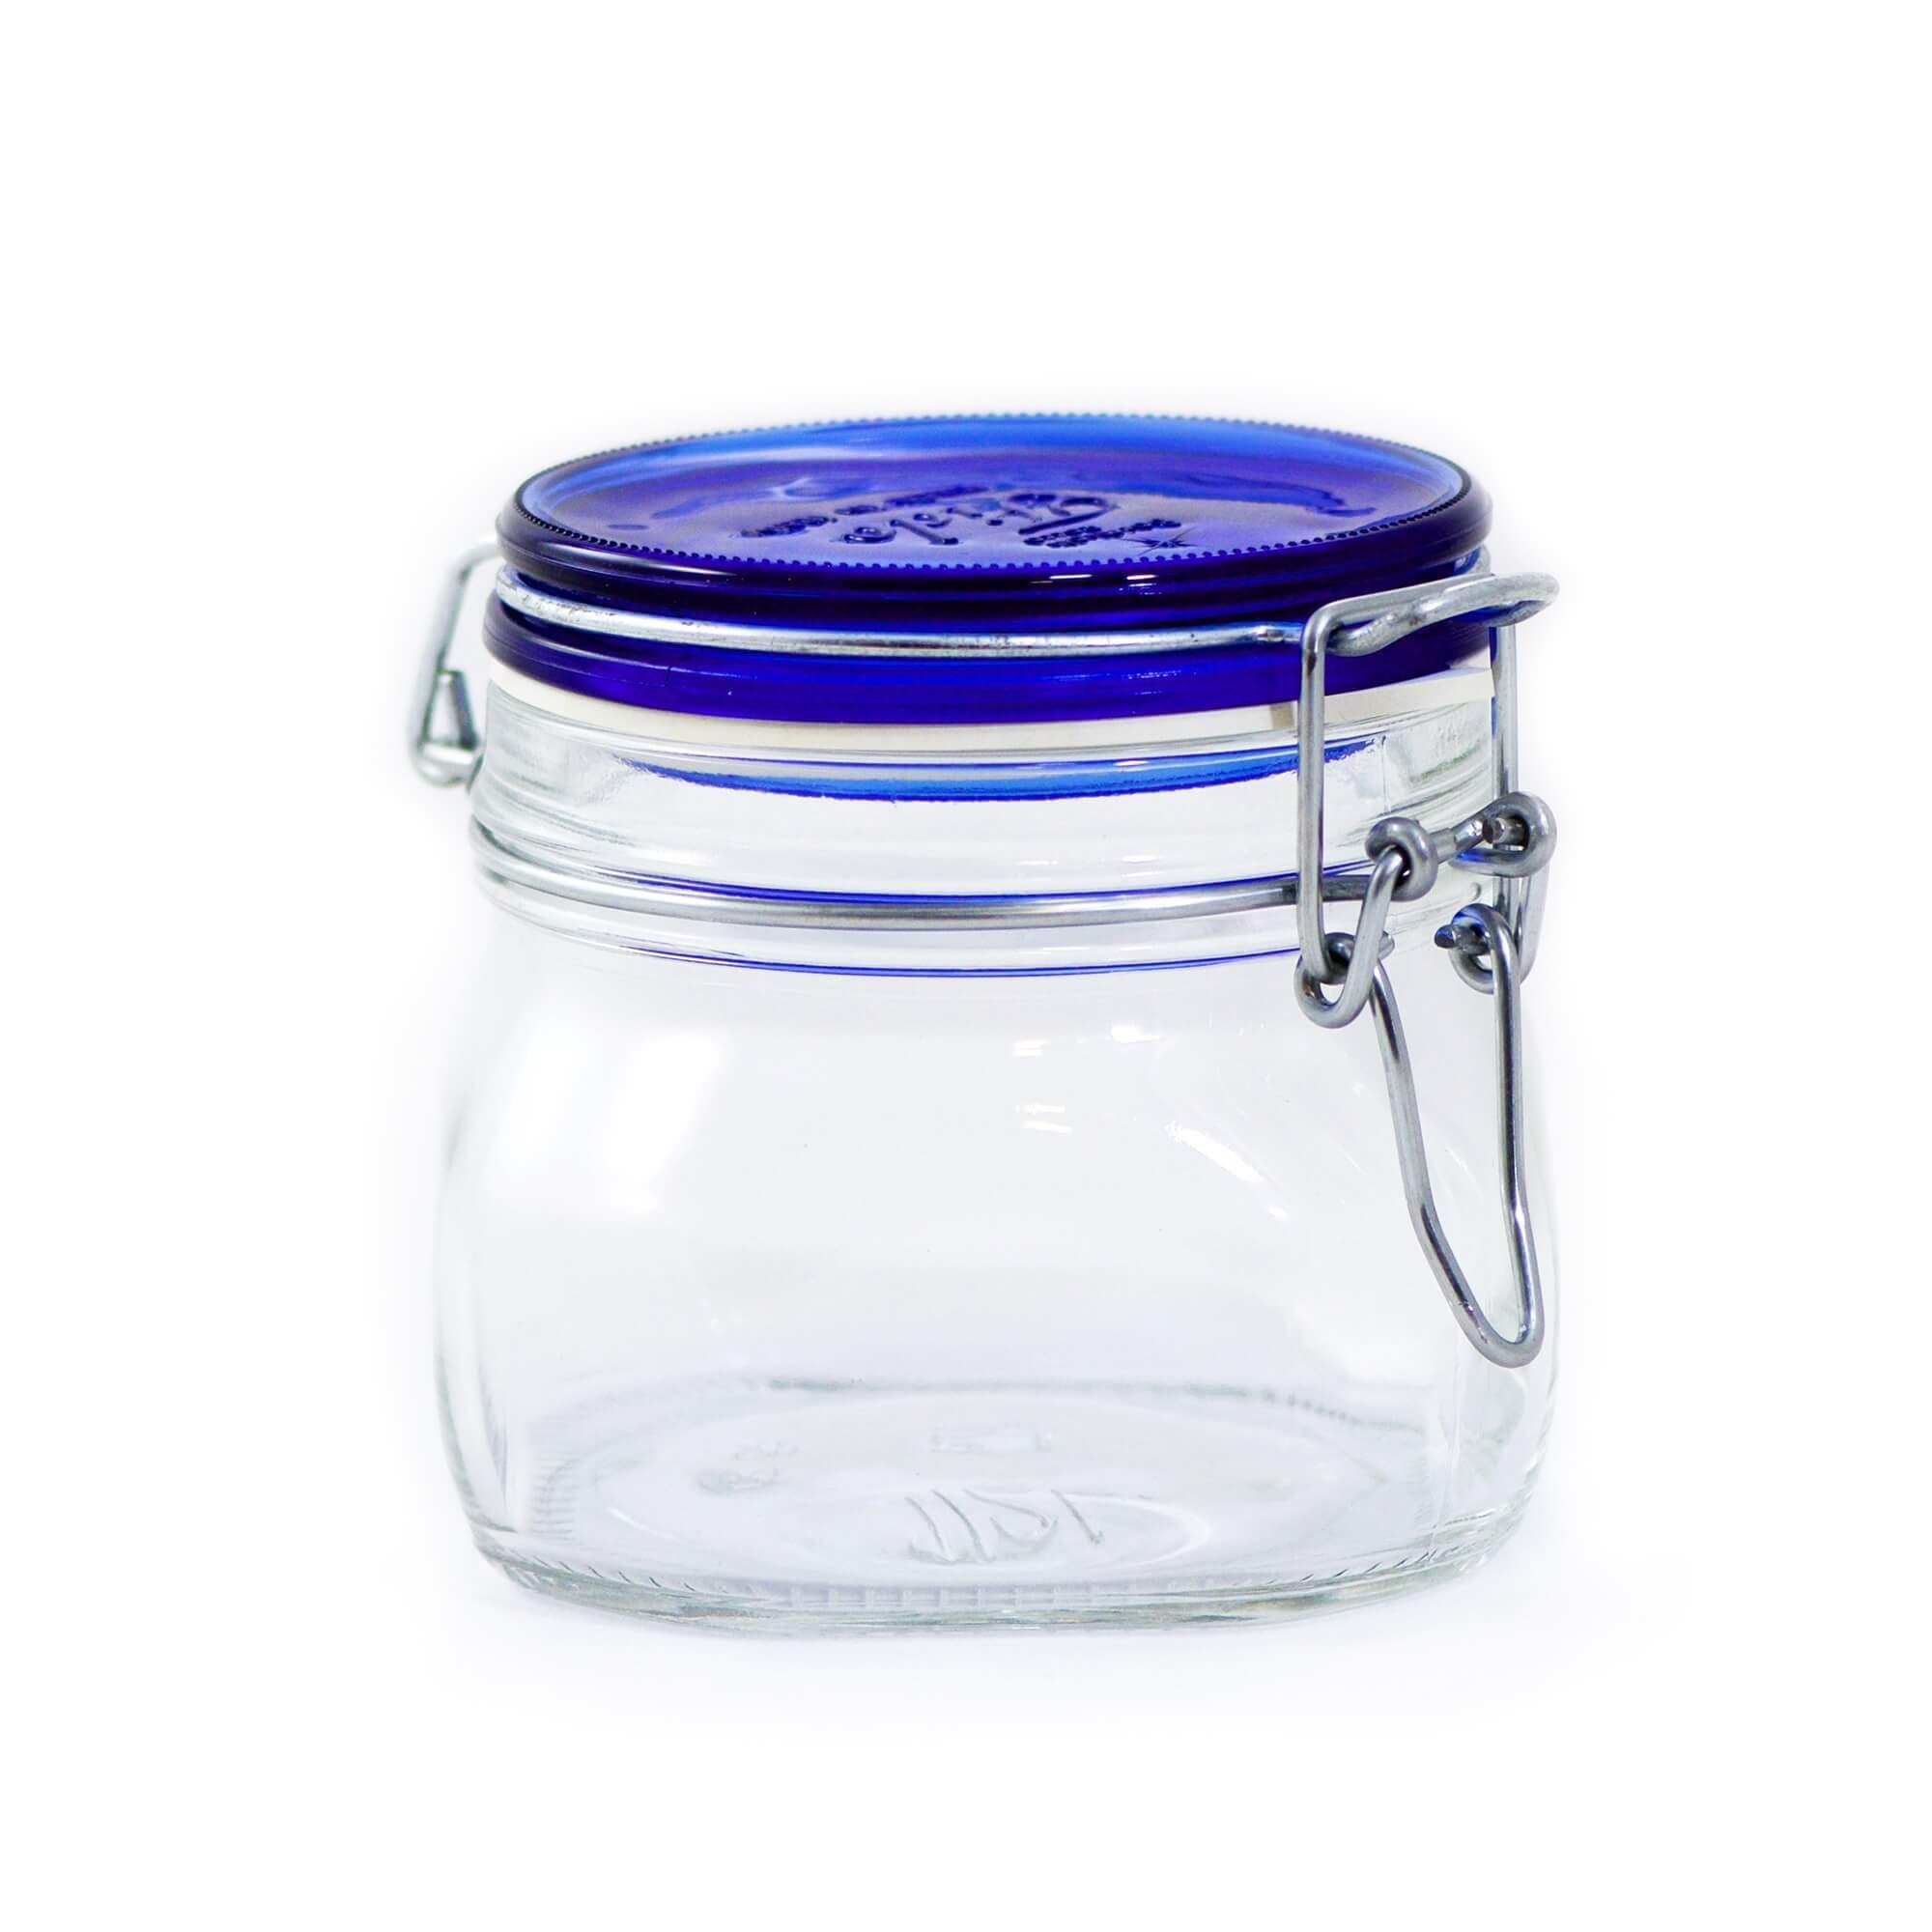 Glob - Fido pote hermético 500ml c/ tp azul